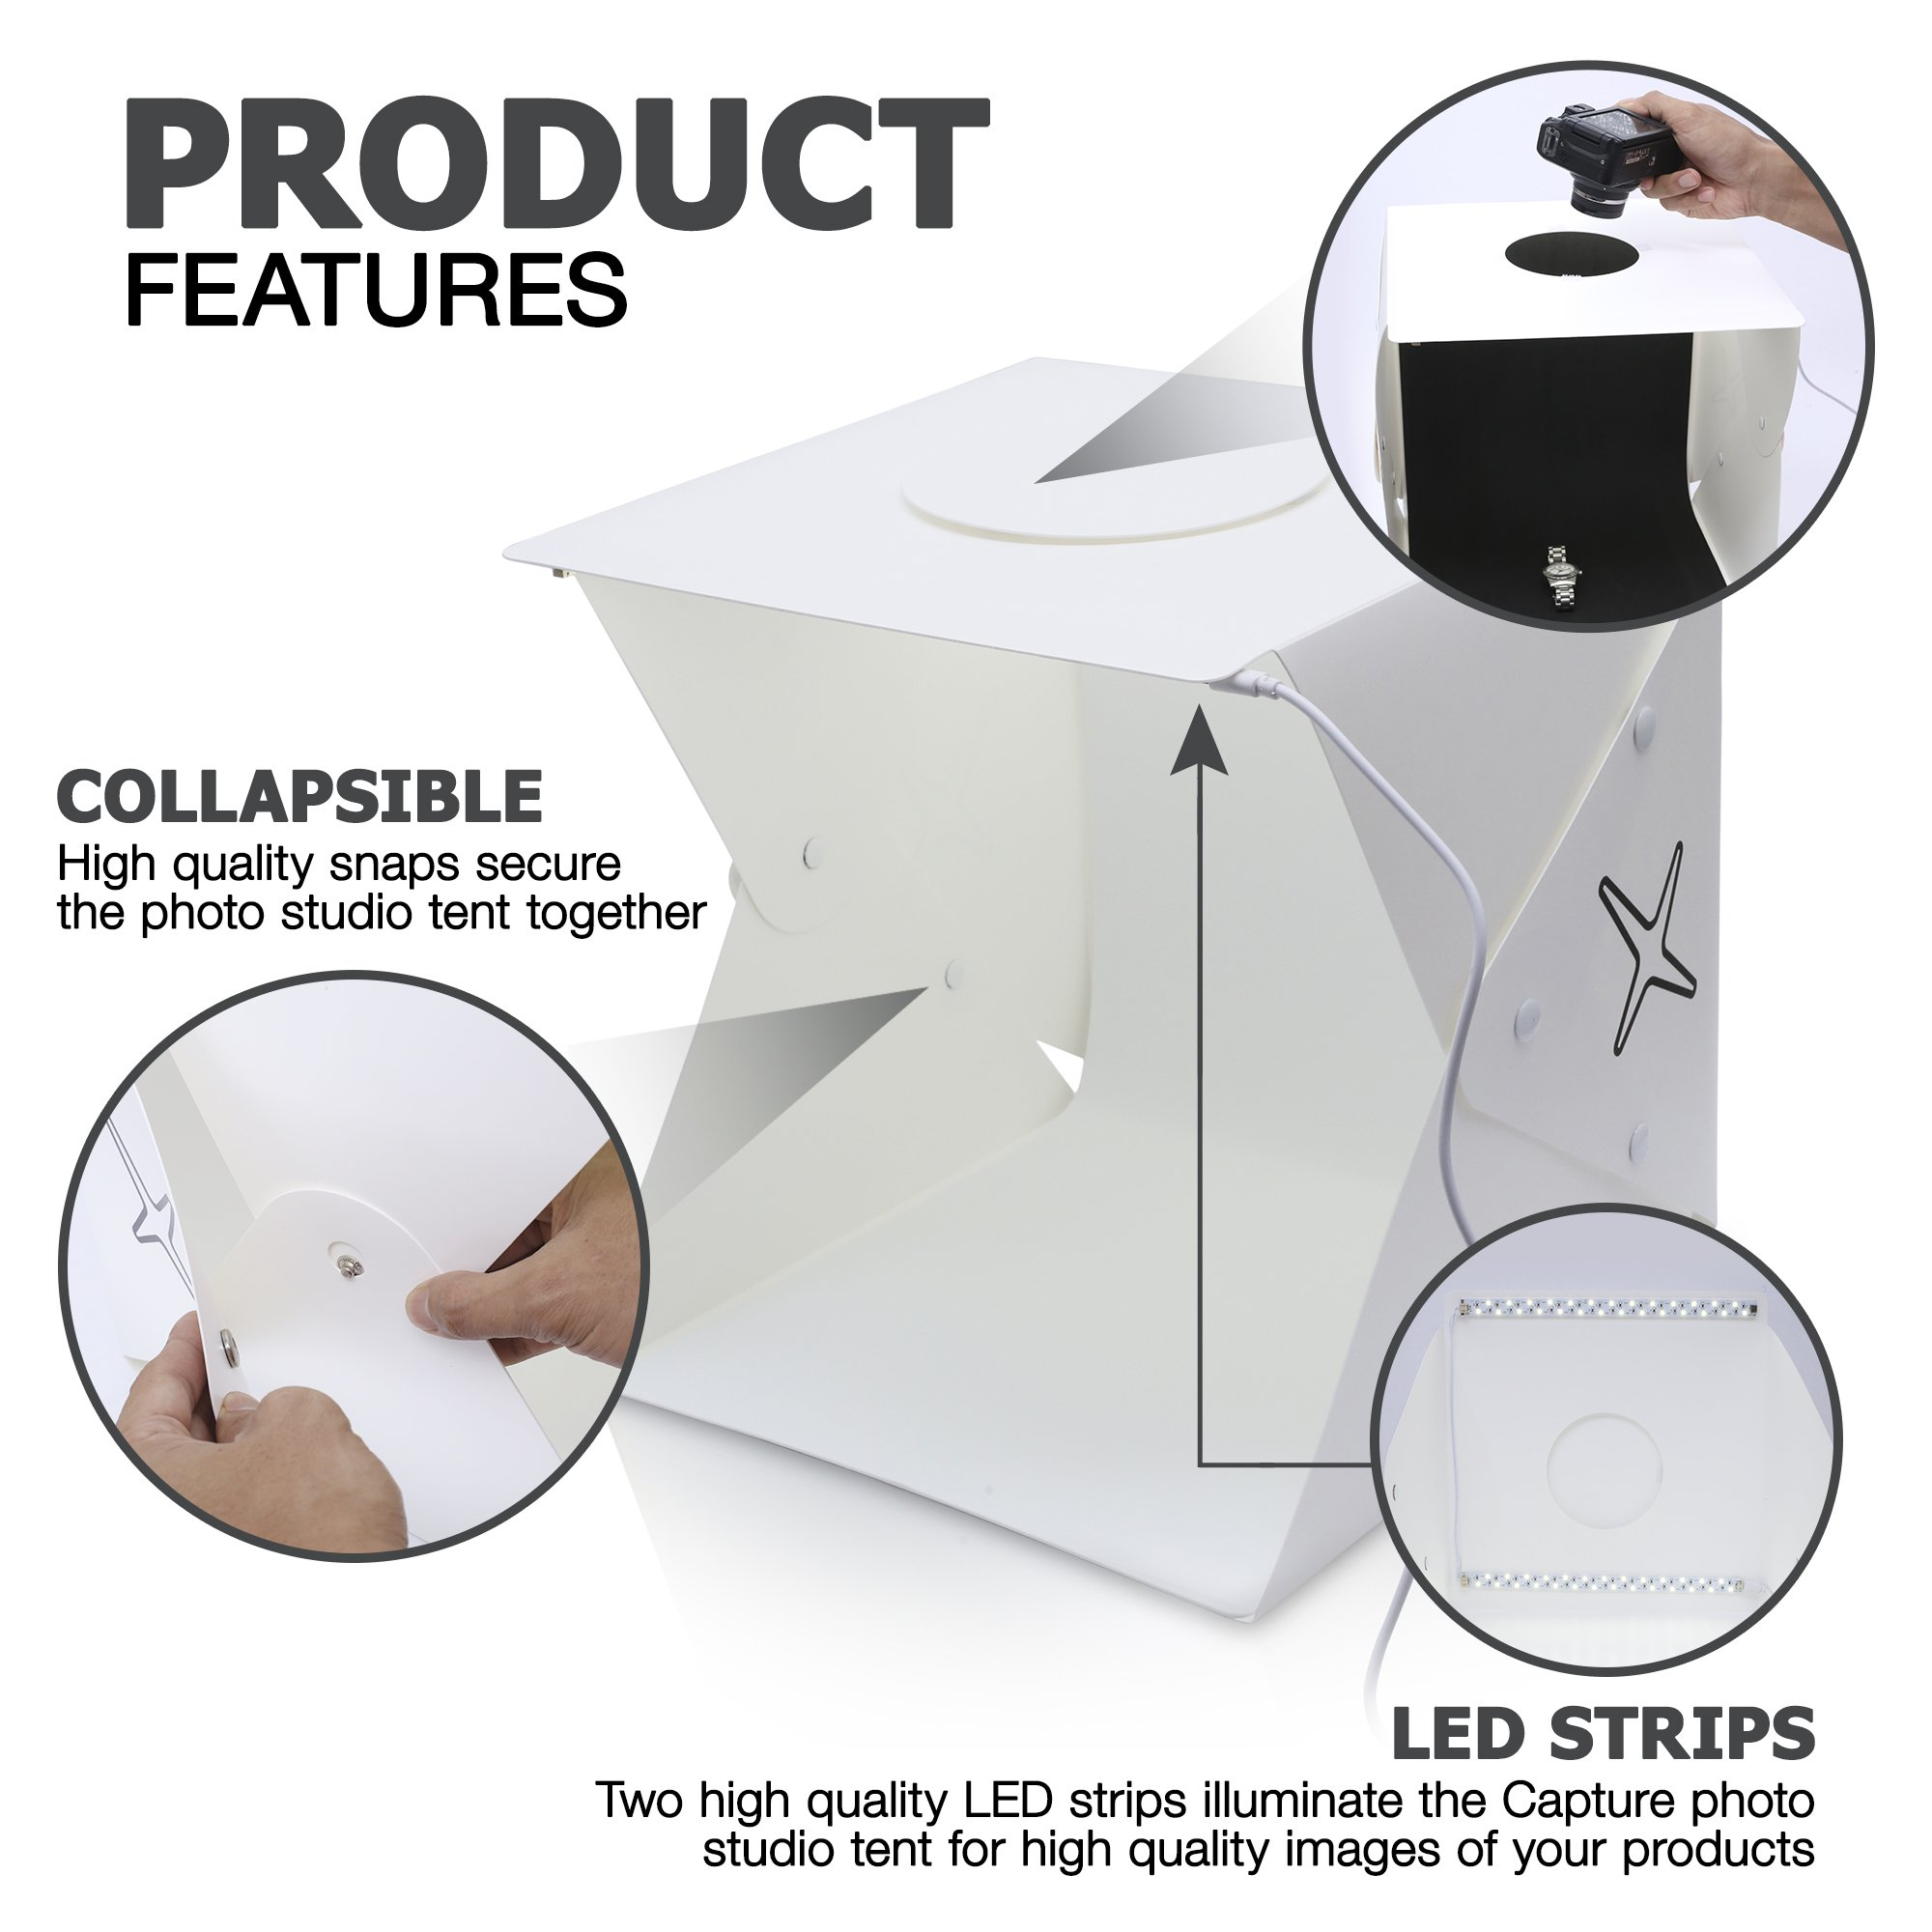 Capture Portable Photo Studio Box: LED Light Box Photo Tent- Large by Capture (Image #2)